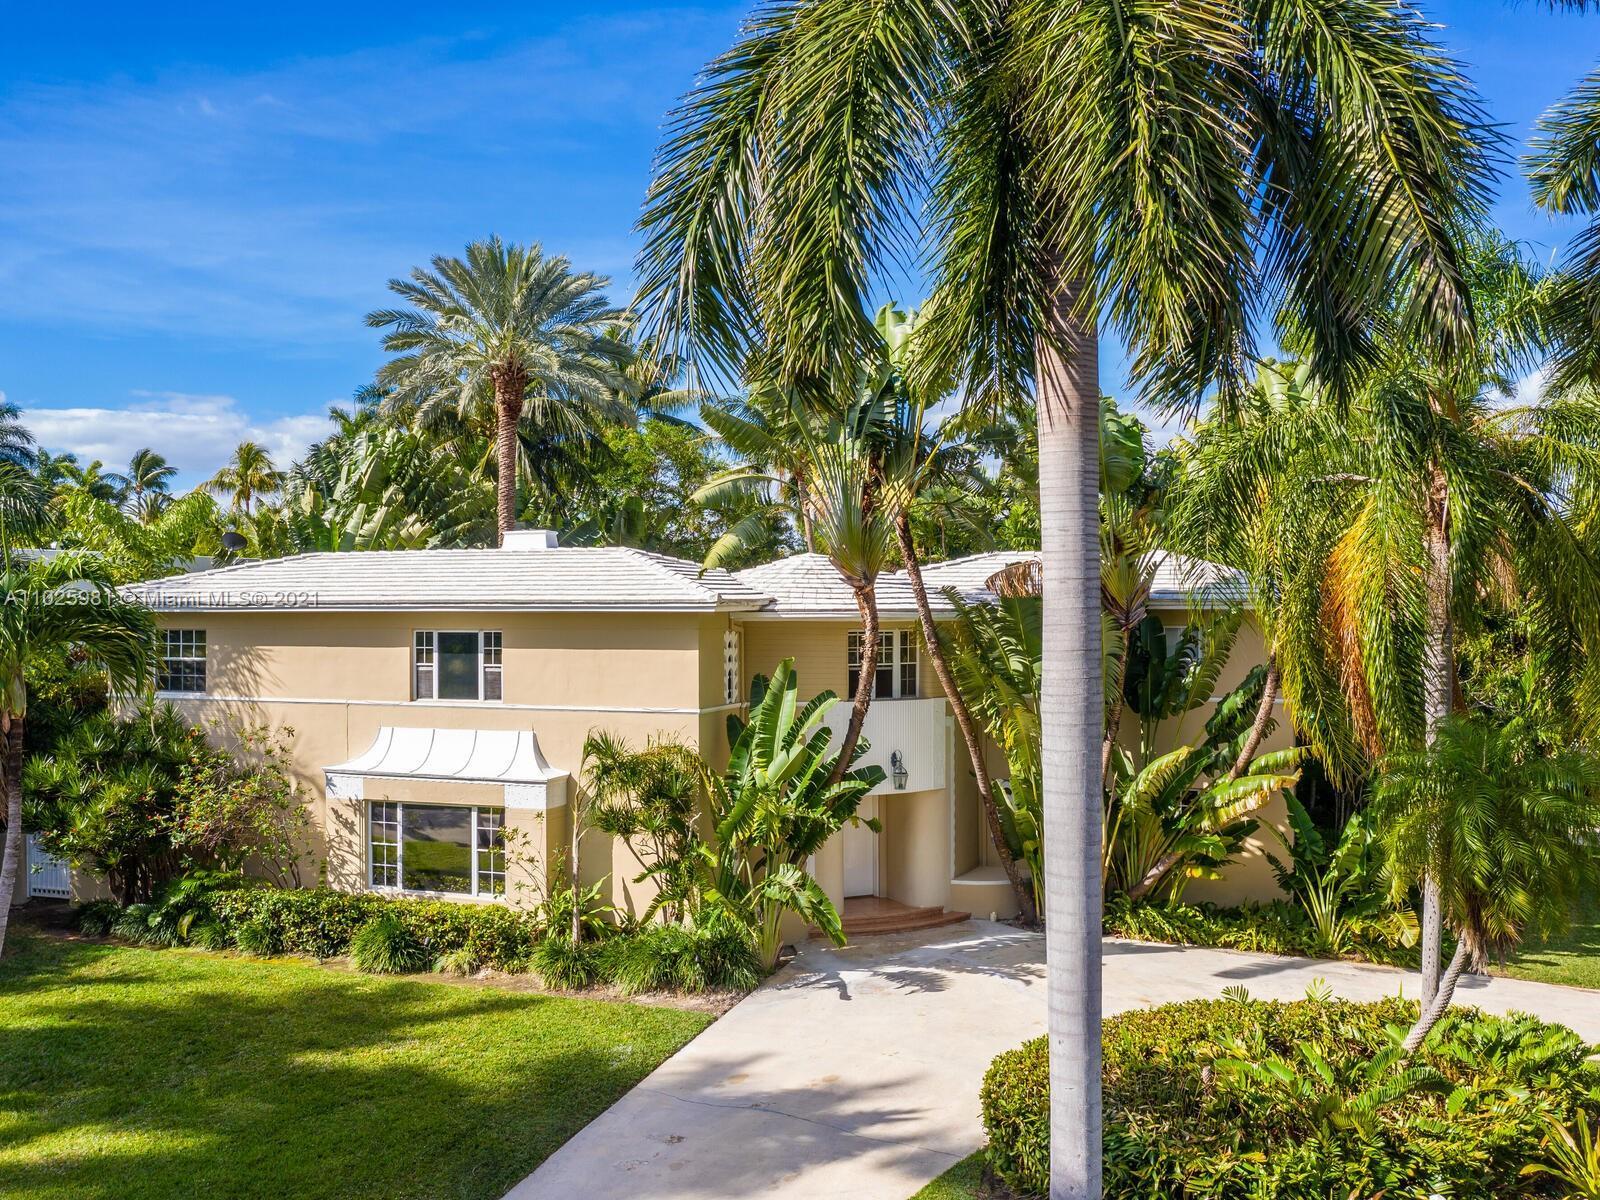 Sunset Islands - 2560 Sunset Dr, Miami Beach, FL 33140